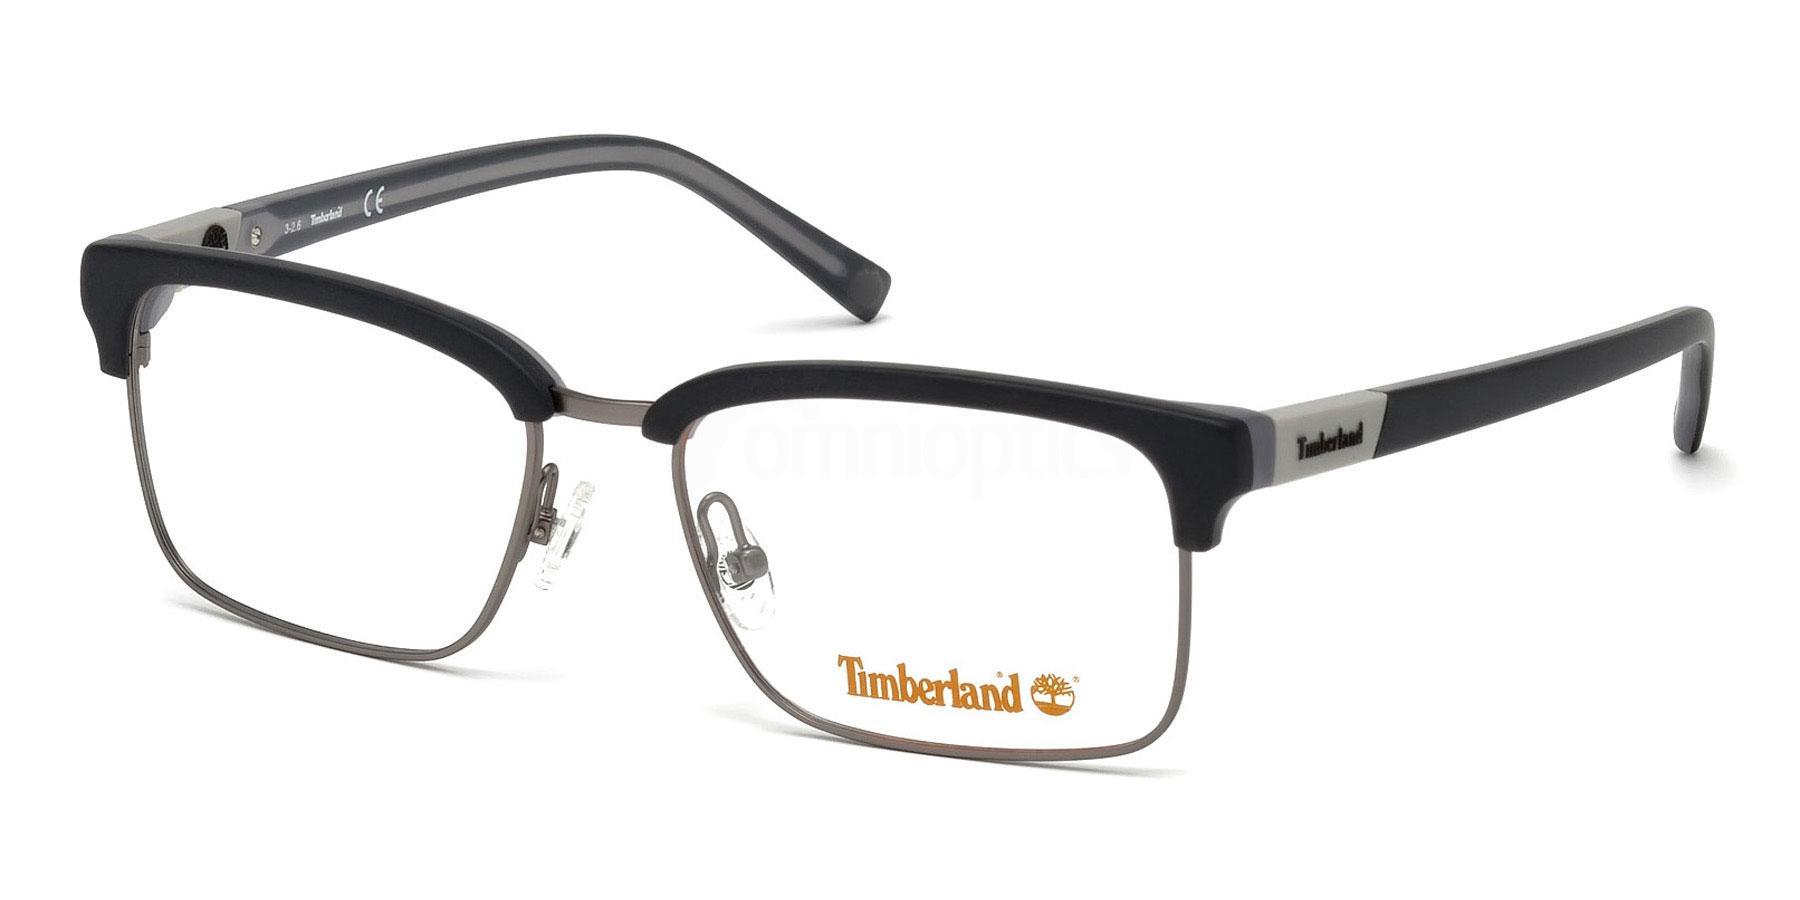 002 TB1570 Glasses, Timberland